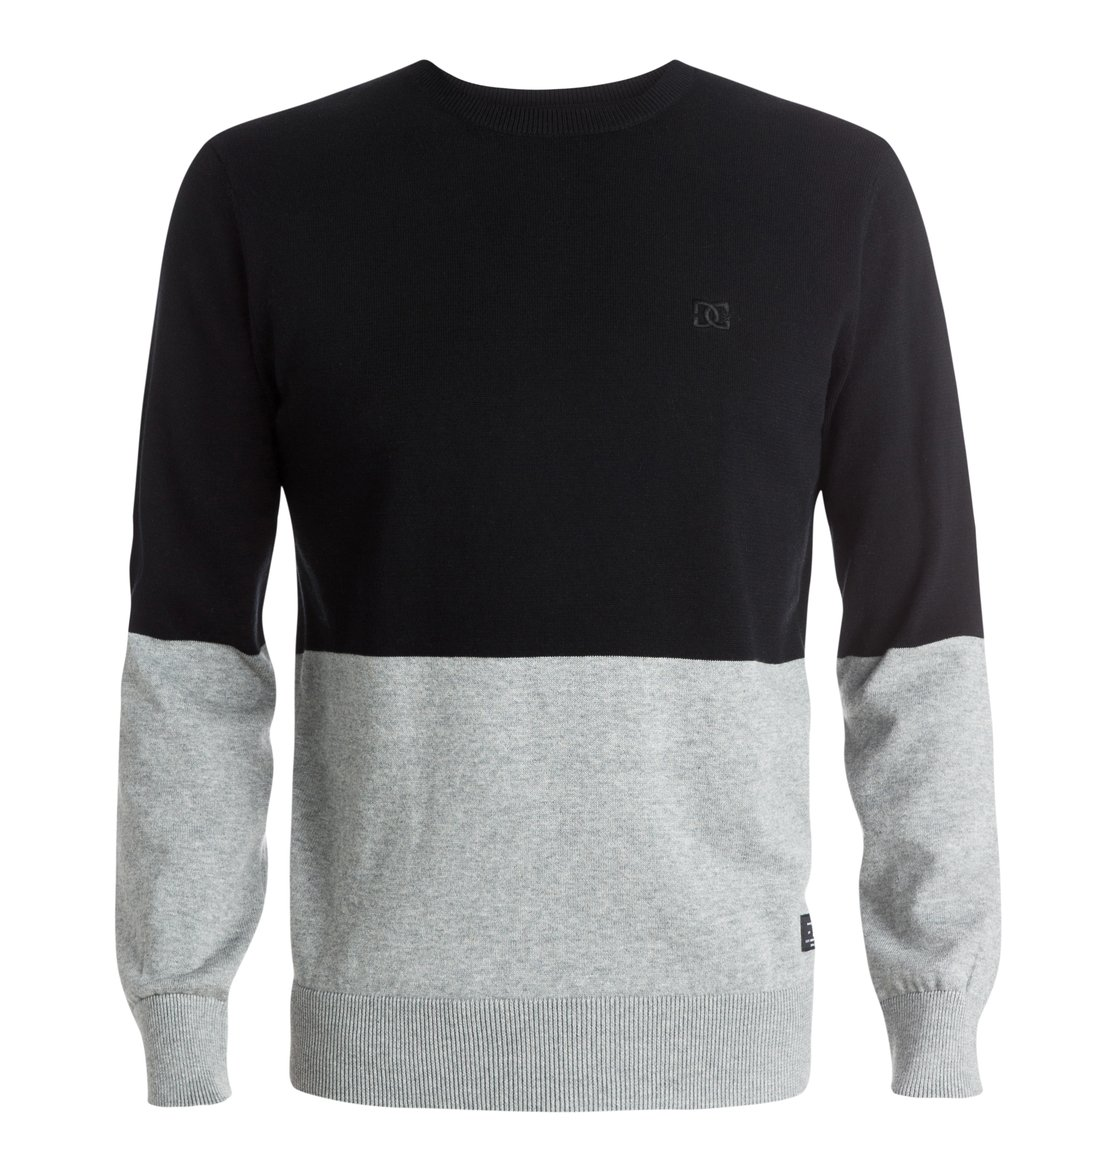 Russelboro - Crew-Neck Sweater - Dcshoes<br>